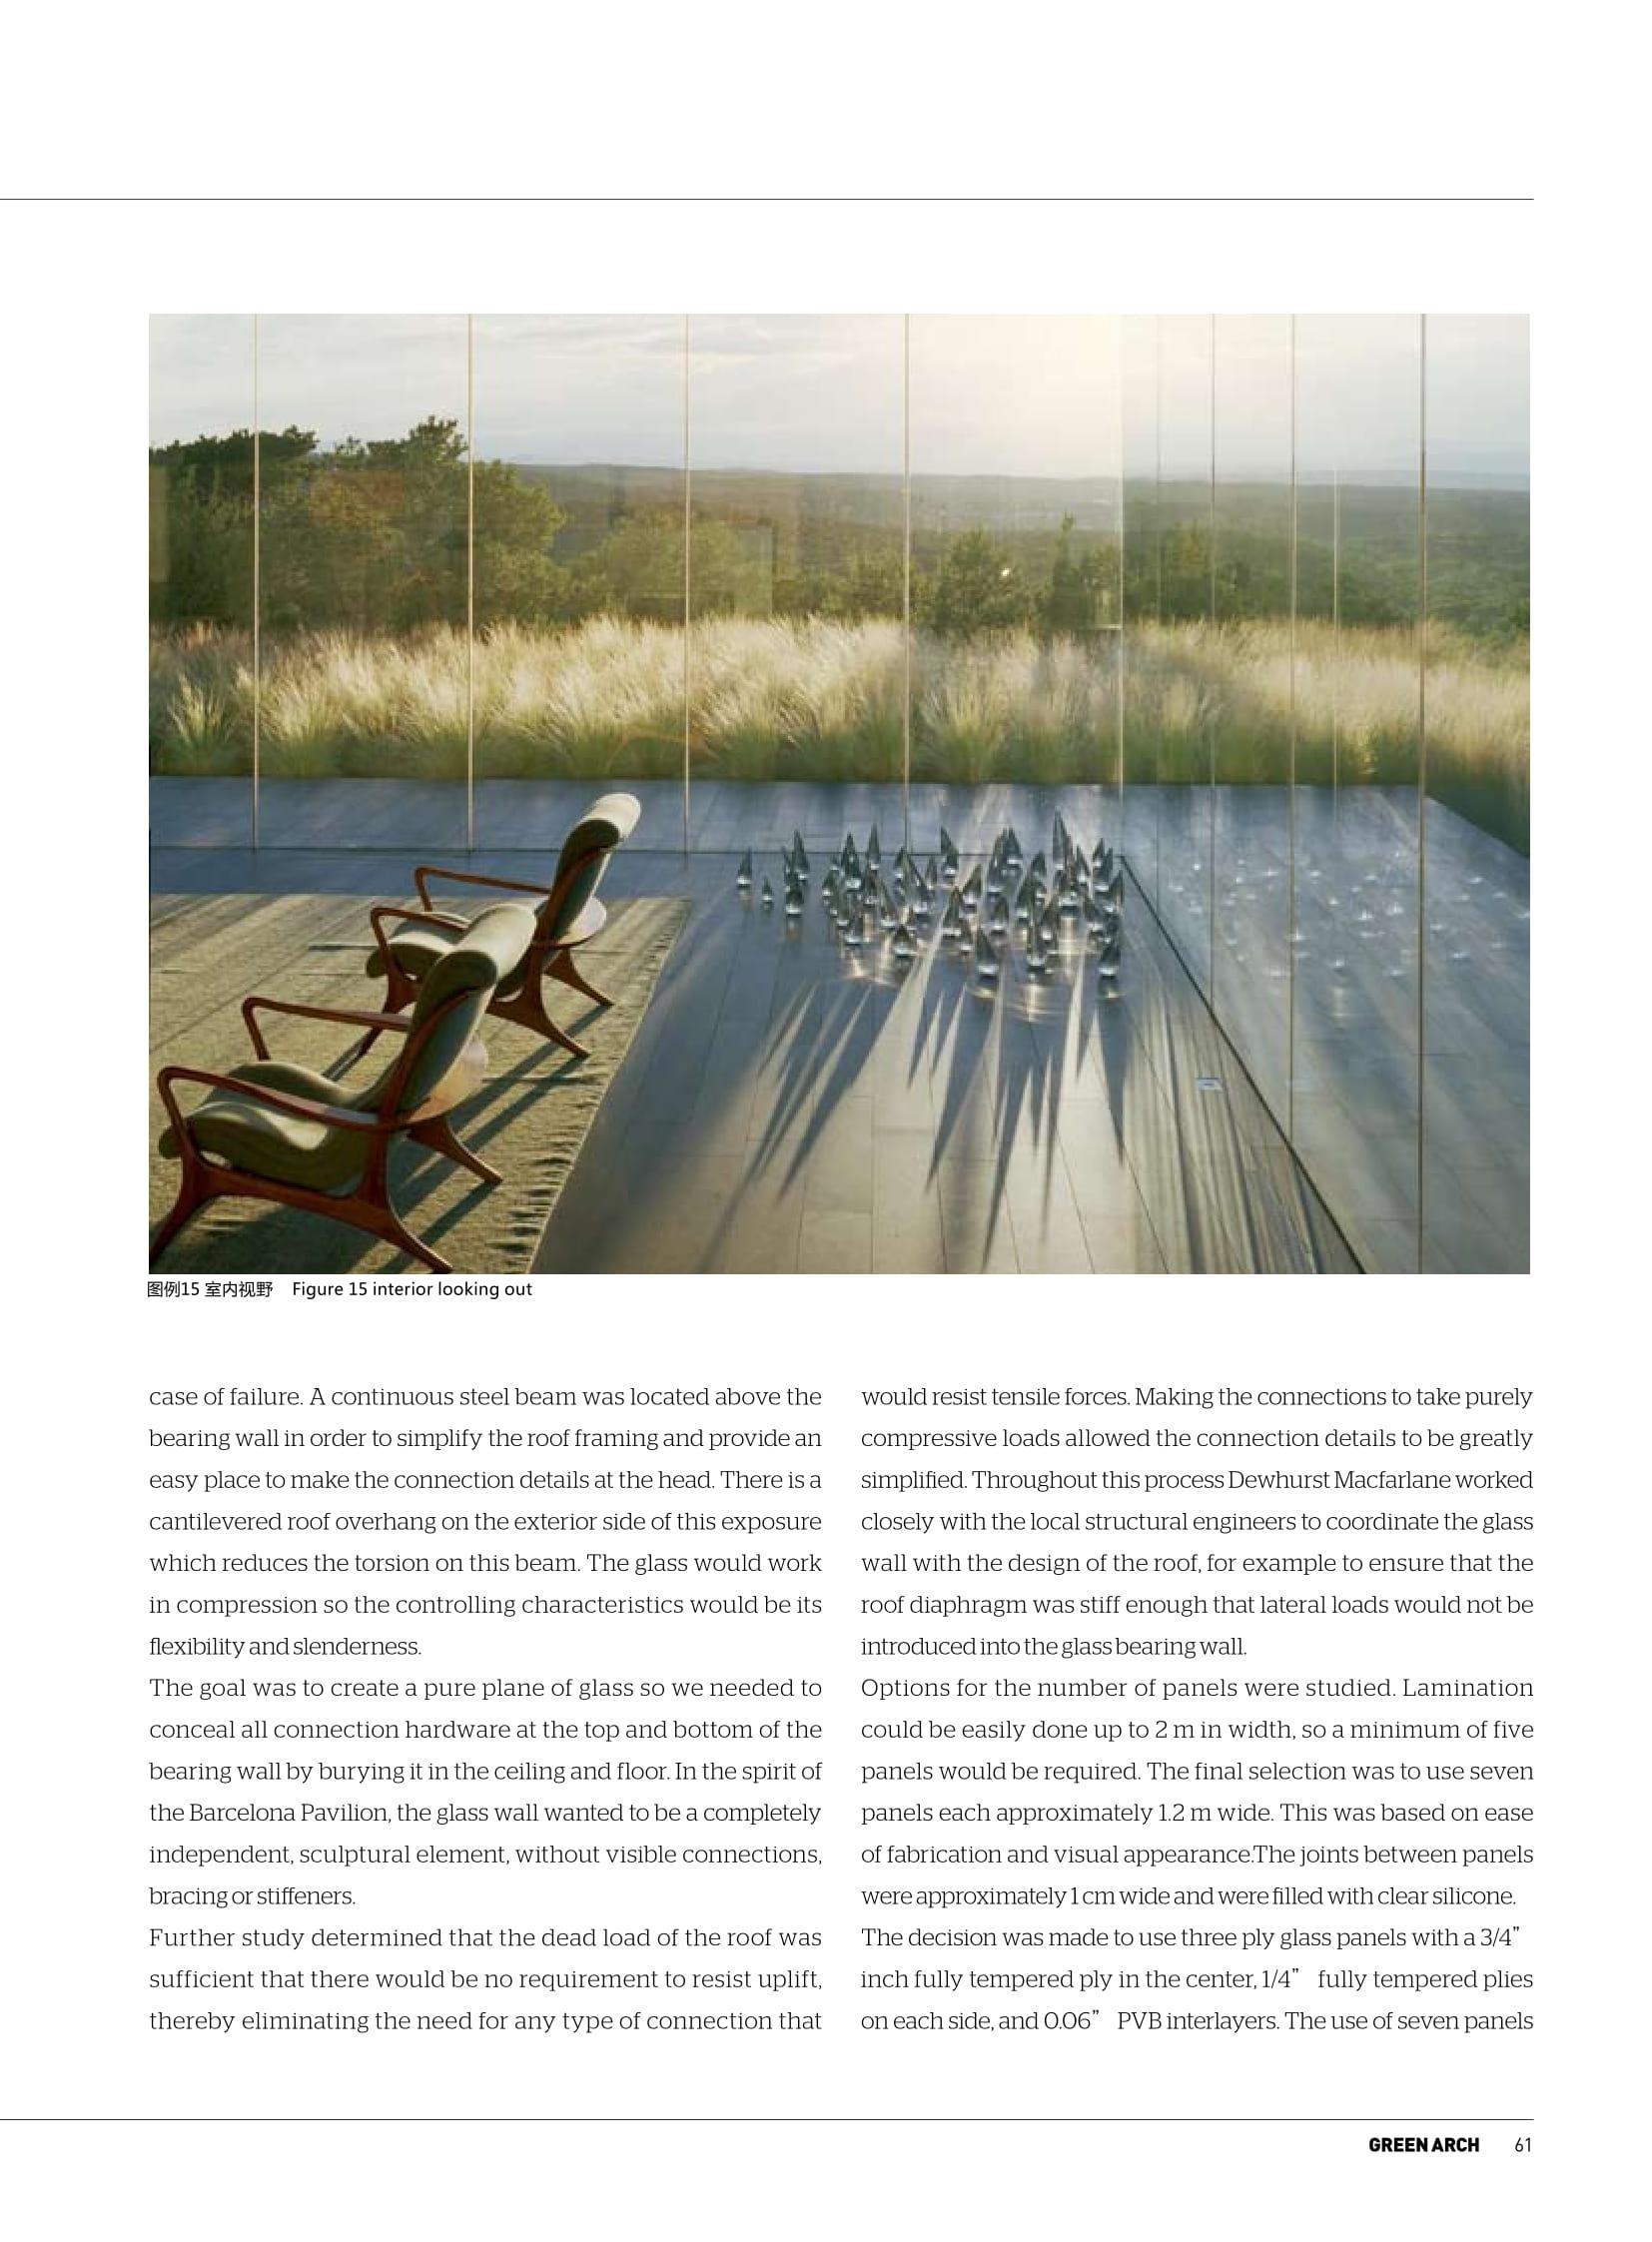 DuBois+Santa+Fe+IGA+Glass+Bearing+Wall-10.jpg